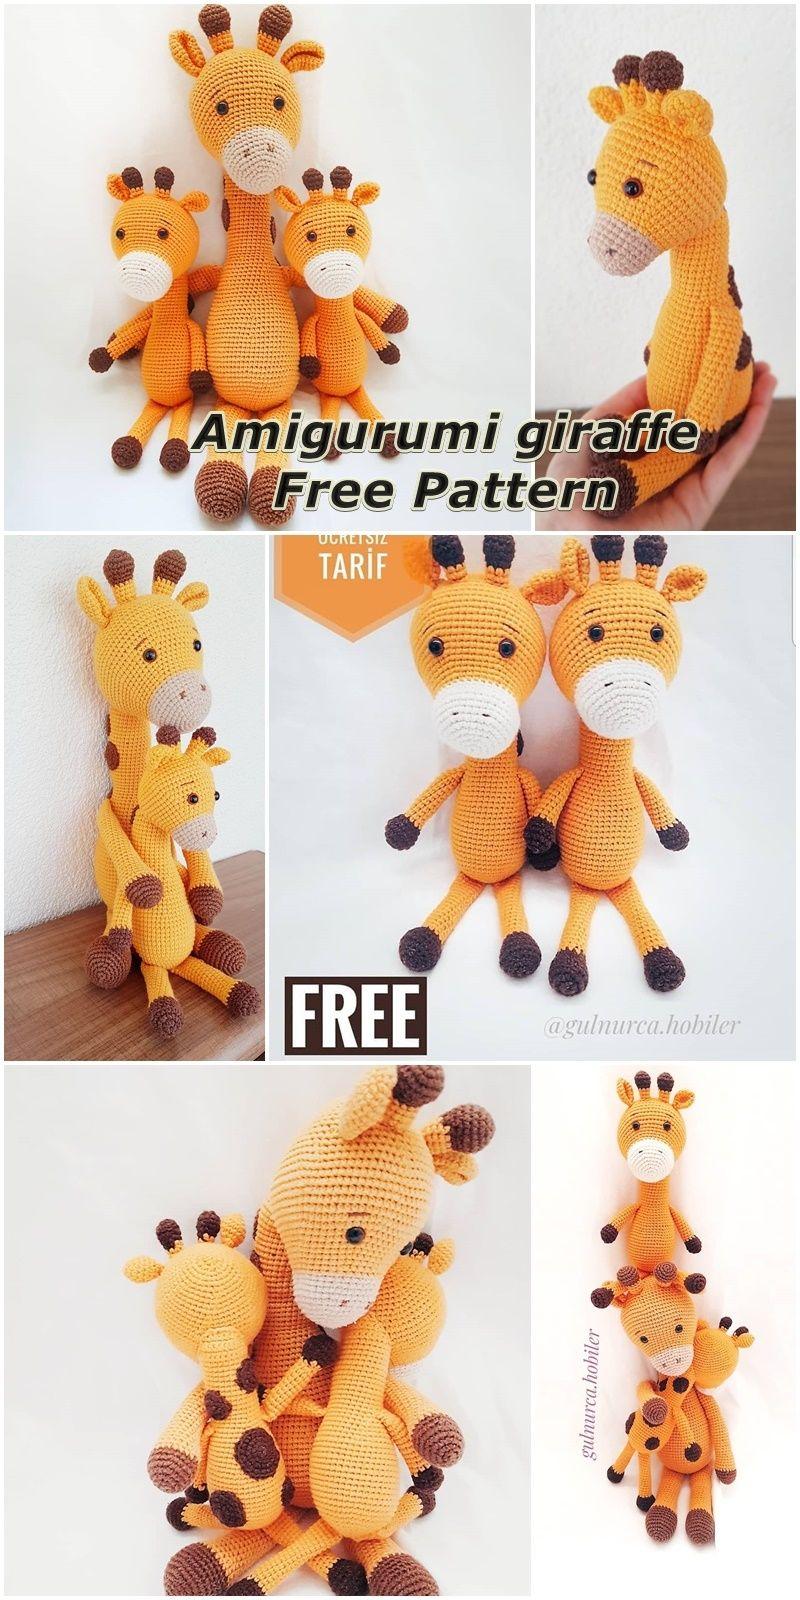 Amigurumi Crochet Pattern - Stanley the Giraffe (With images ... | 1600x800